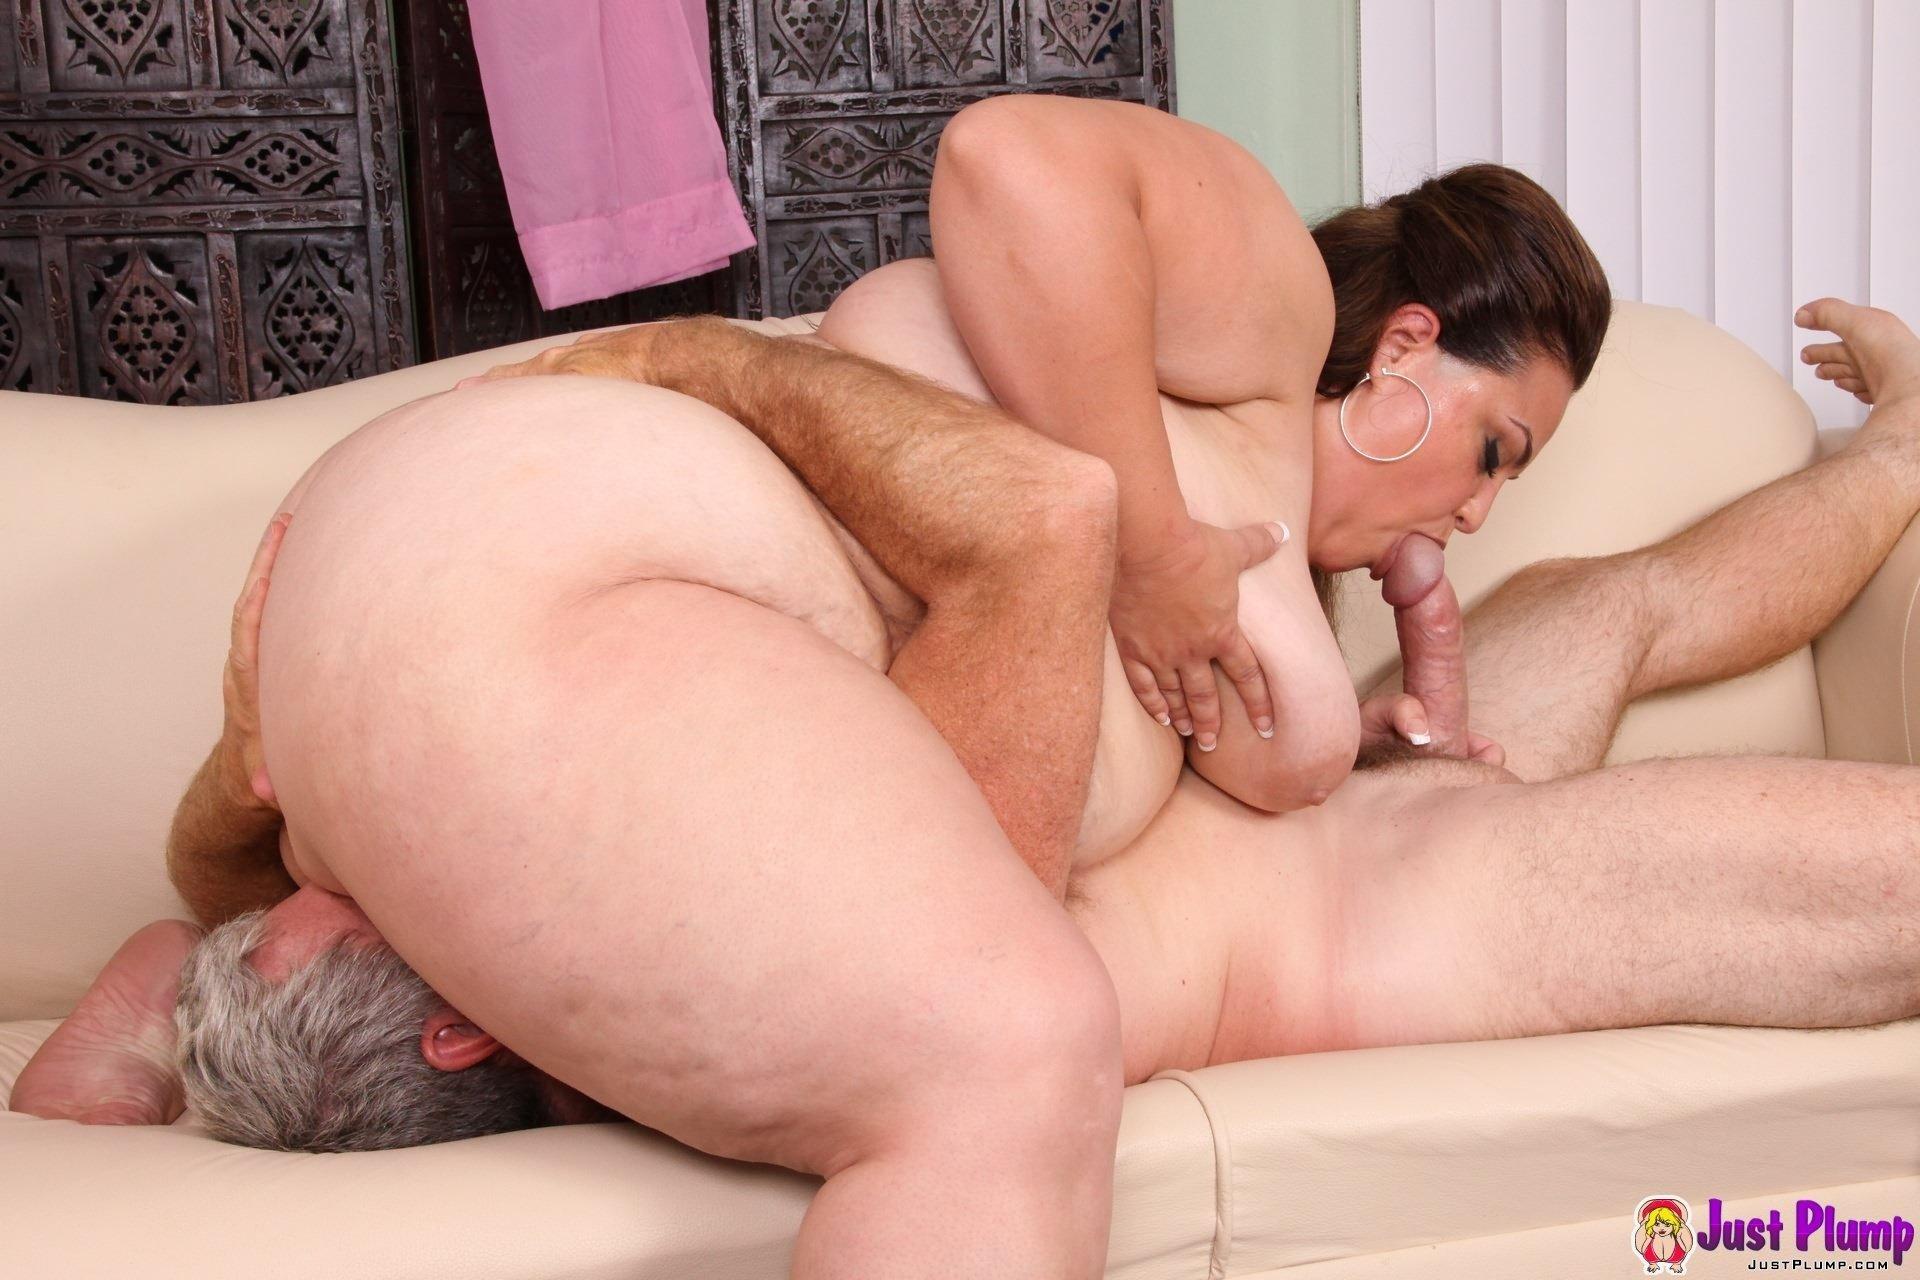 oralniy-seks-polnie-foto-galerei-porno